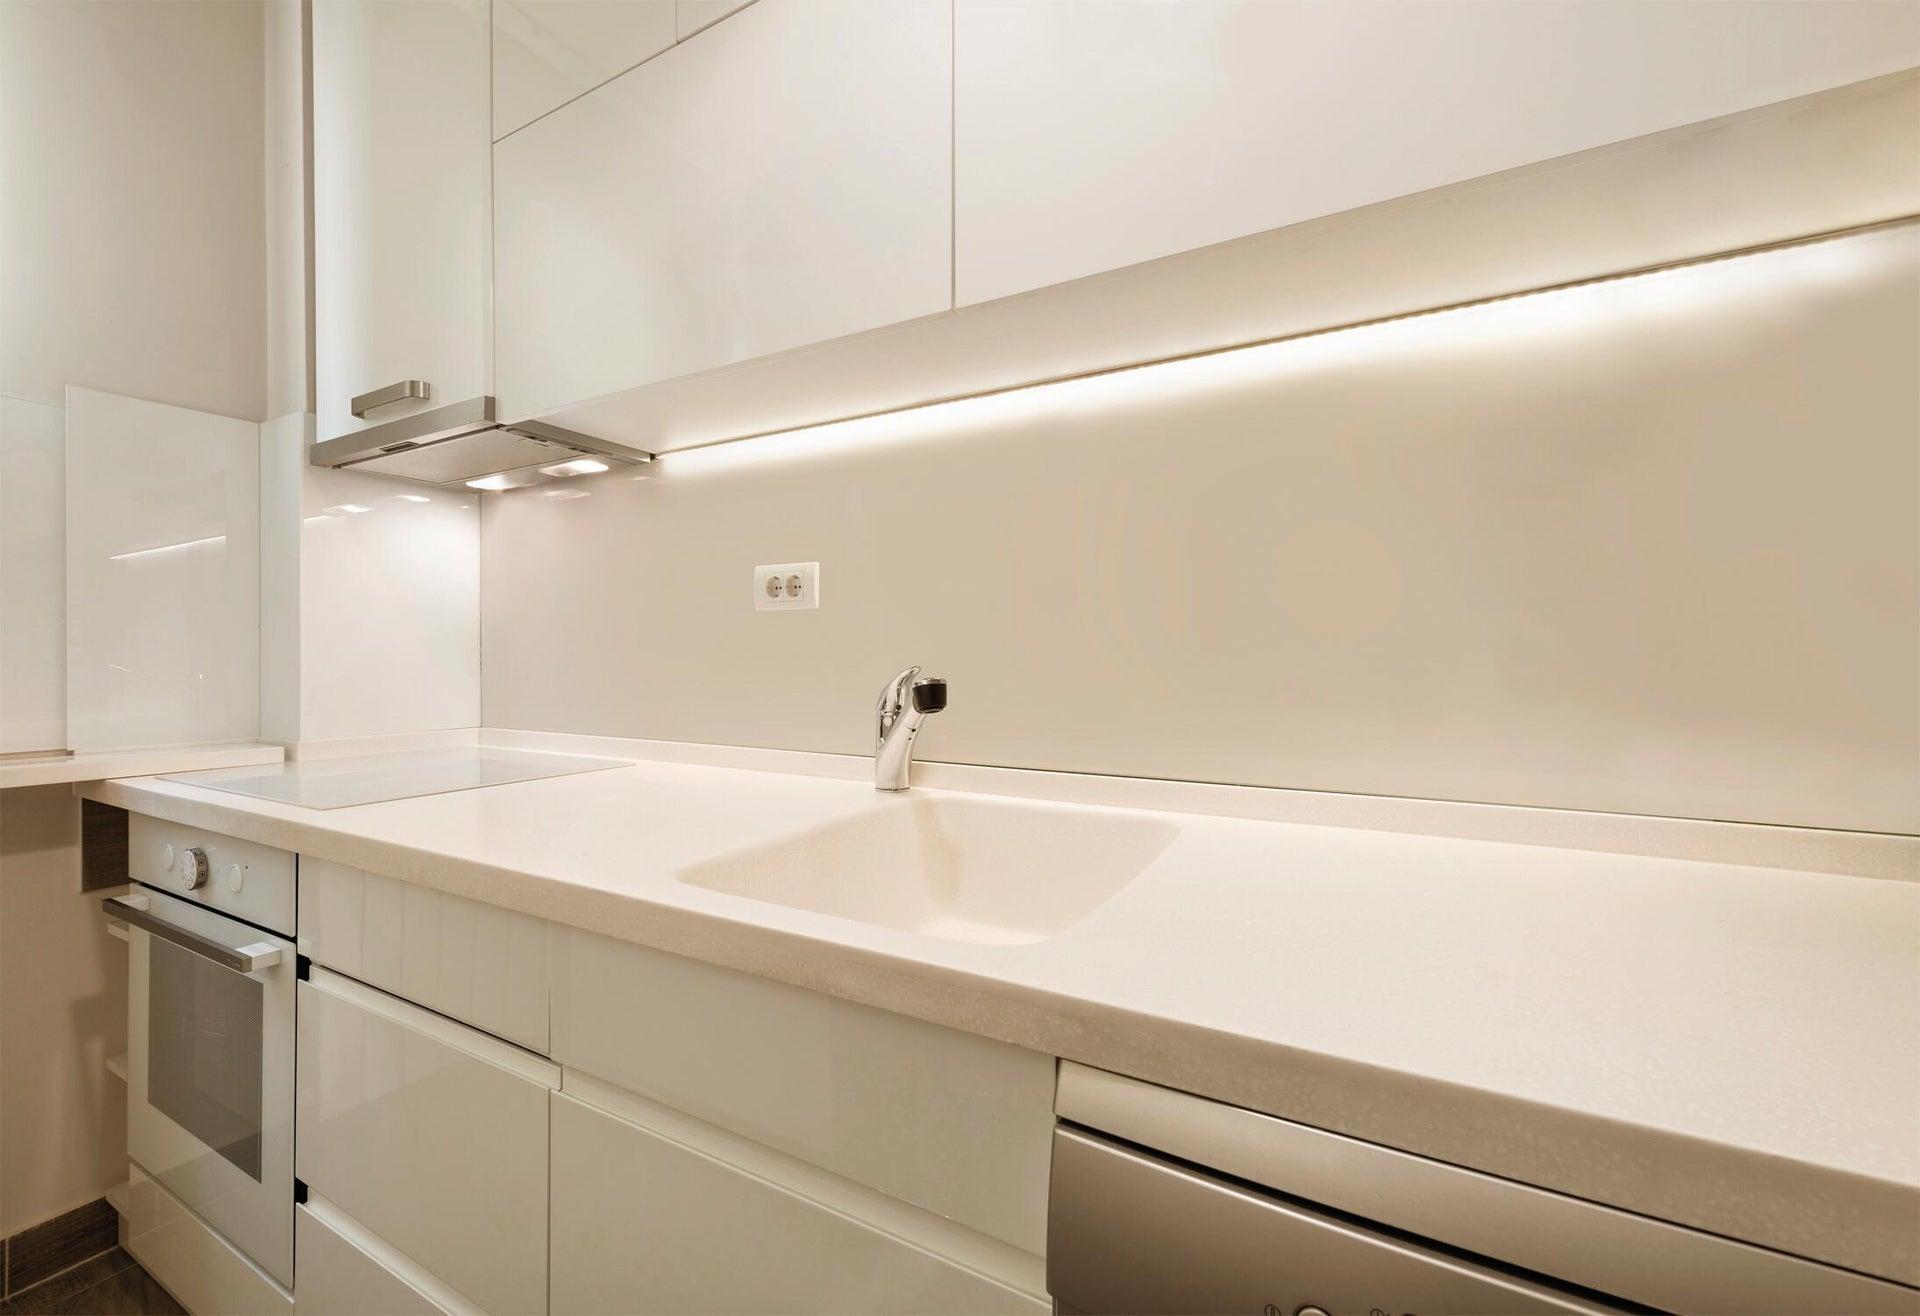 Striscia led 5m luce cct regolazione da bianco caldo a bianco freddo 400LM IP20 INSPIRE - 4